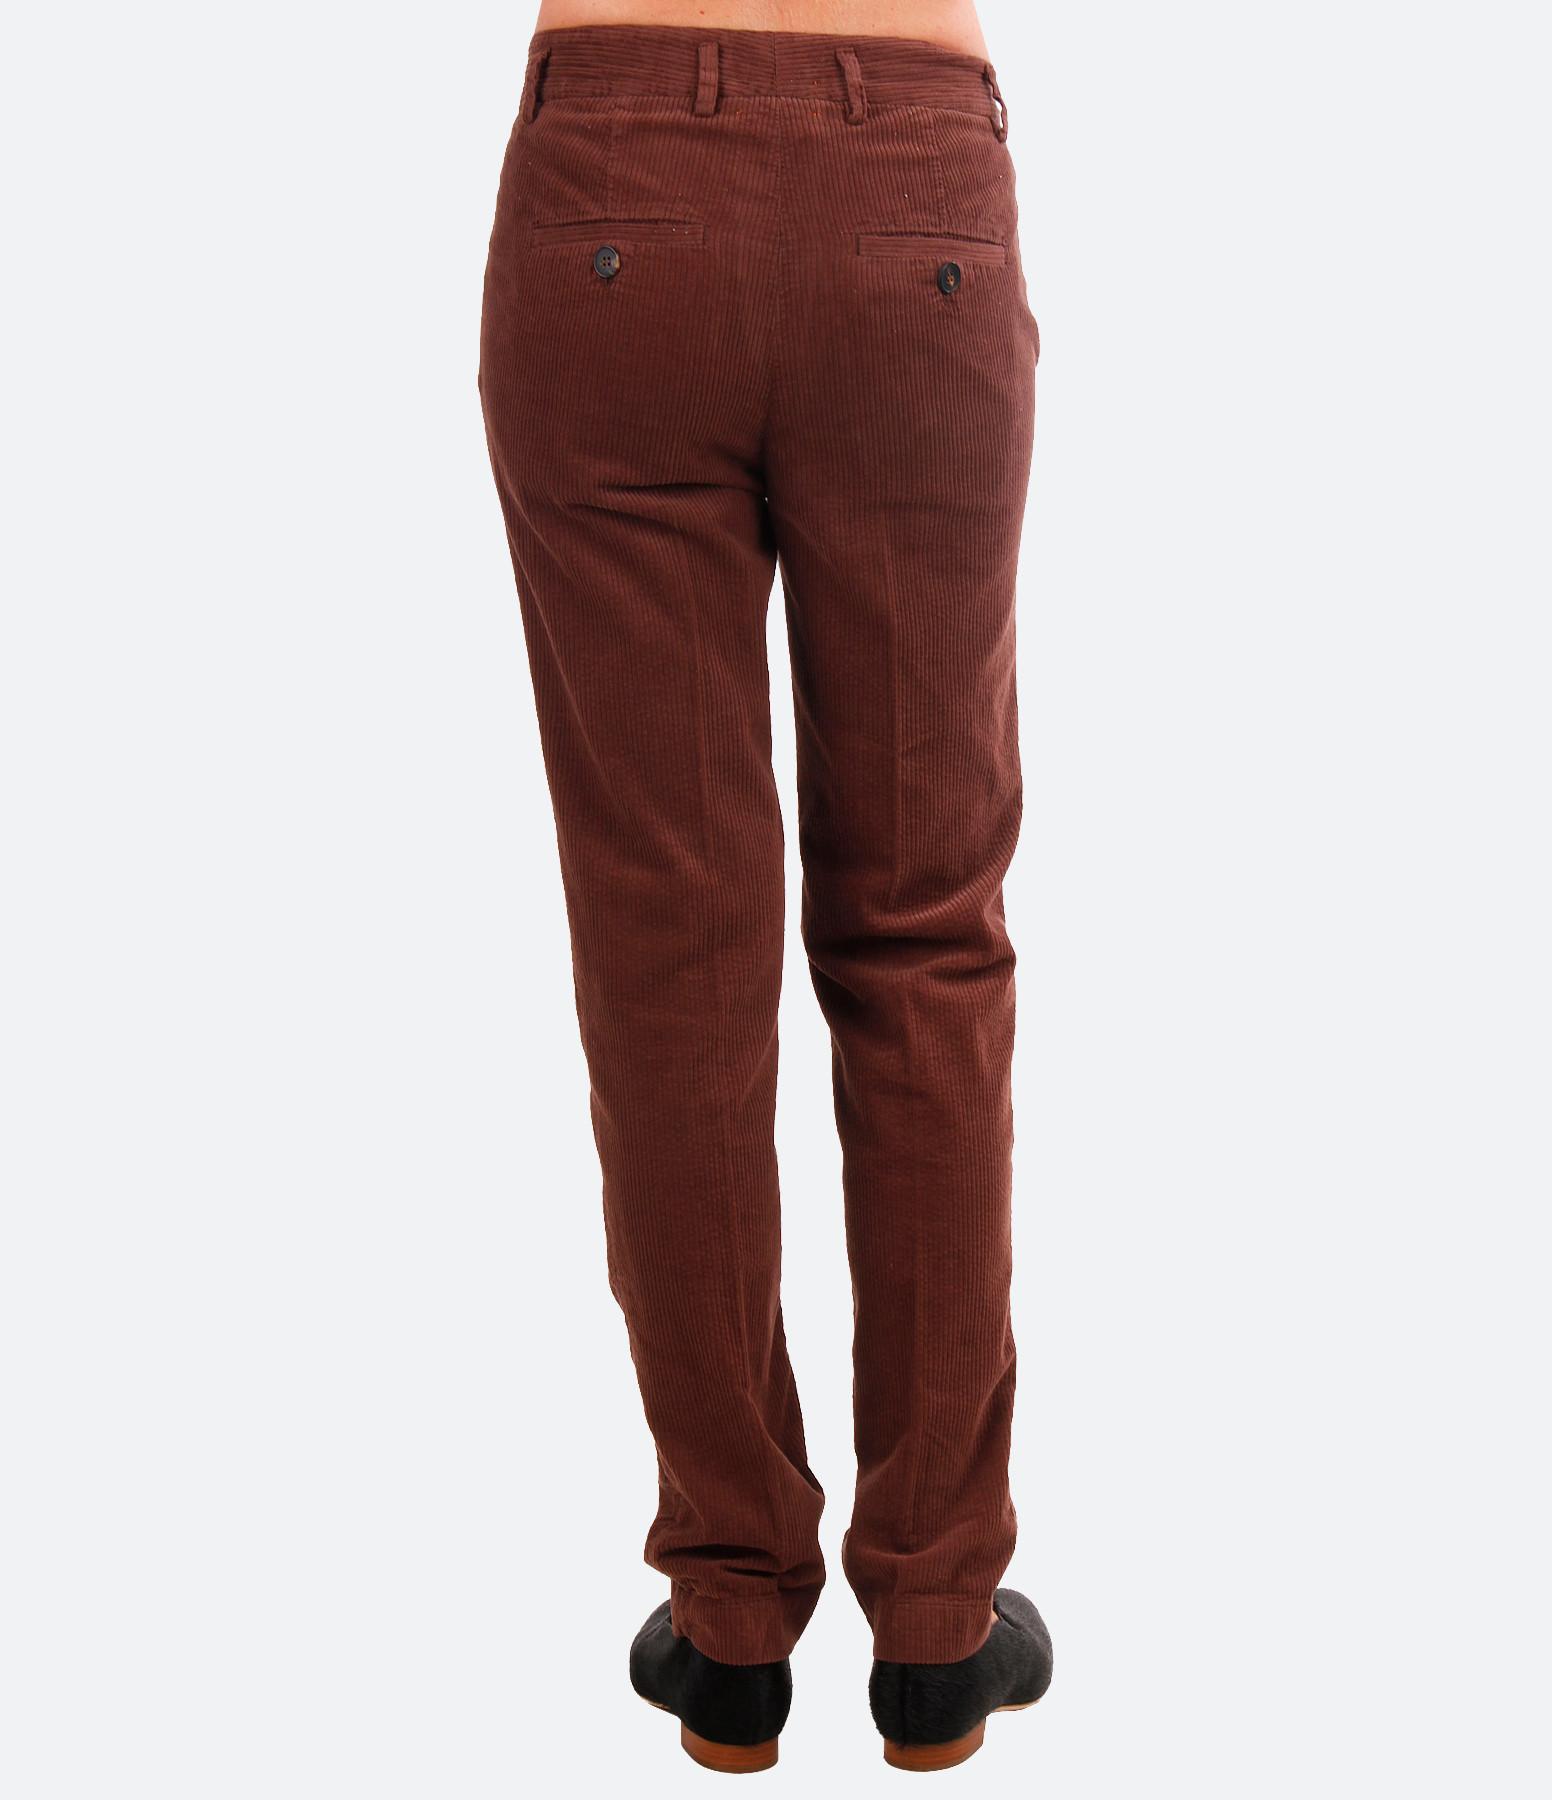 Pantalon en Velours Cacao - Forte_Forte